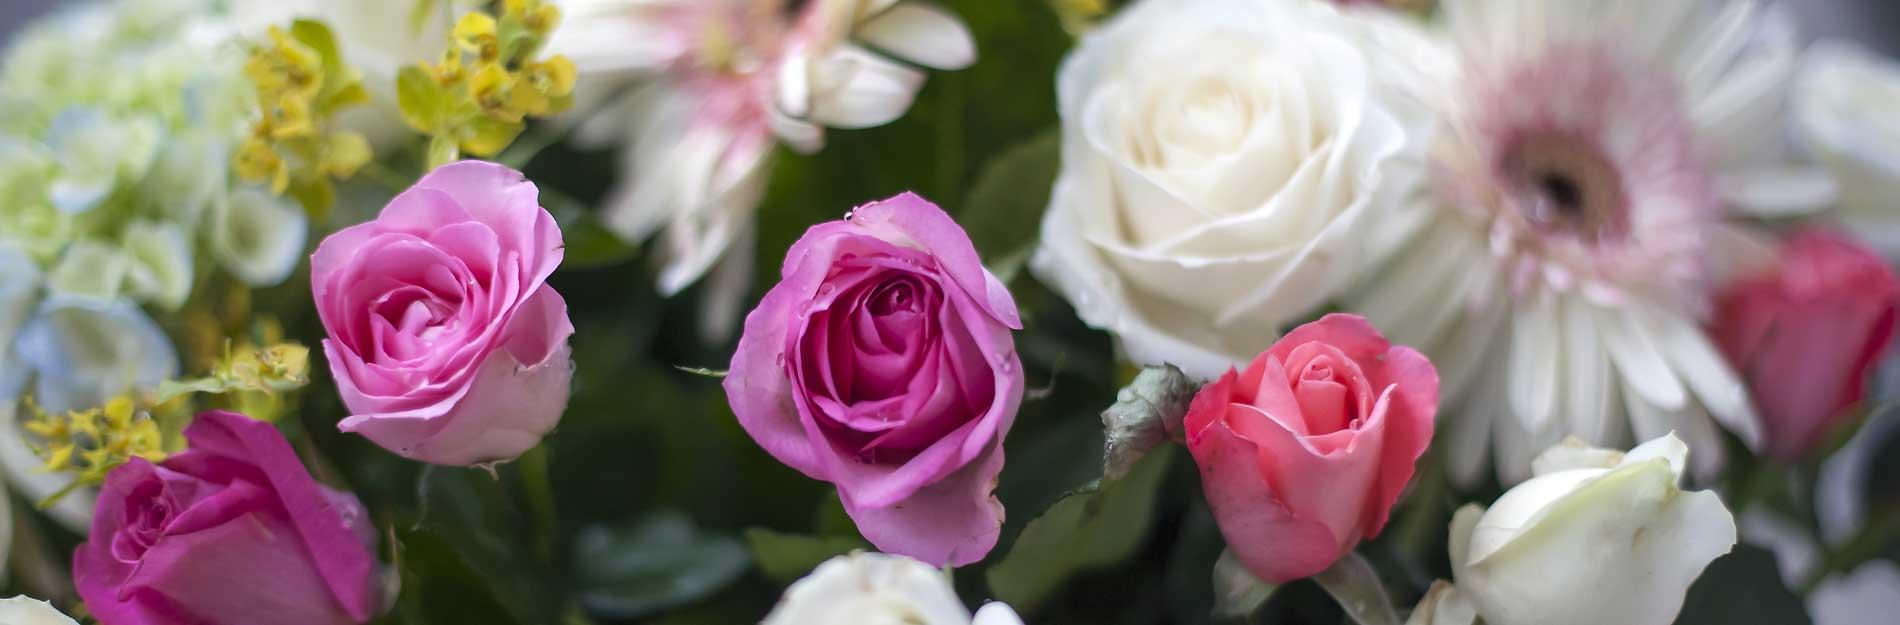 Fleurs photo mariage vietnam